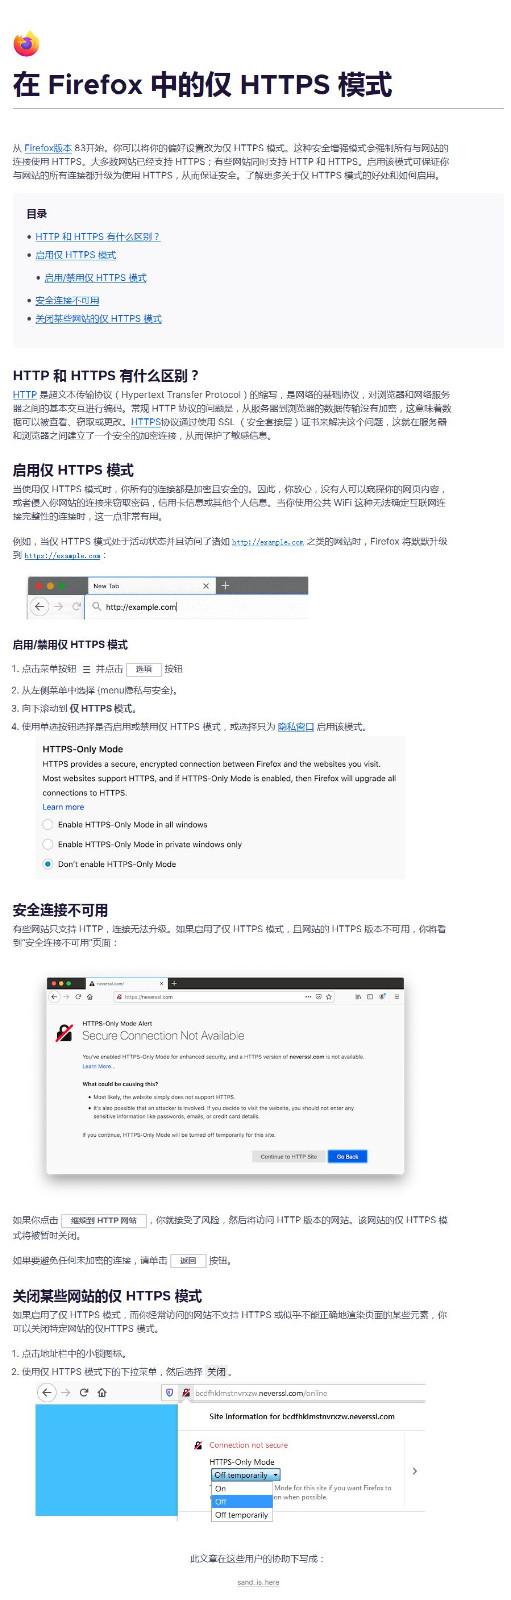 Screenshot_2020-11-20 在 Firefox 中的仅 HTTPS 模式 Firefox 帮助.jpg